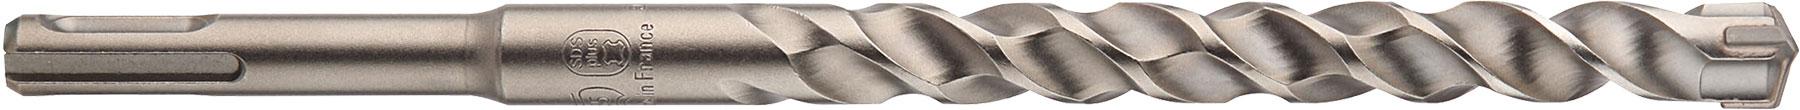 113 - Diager Booster Plus burgija za armirani beton